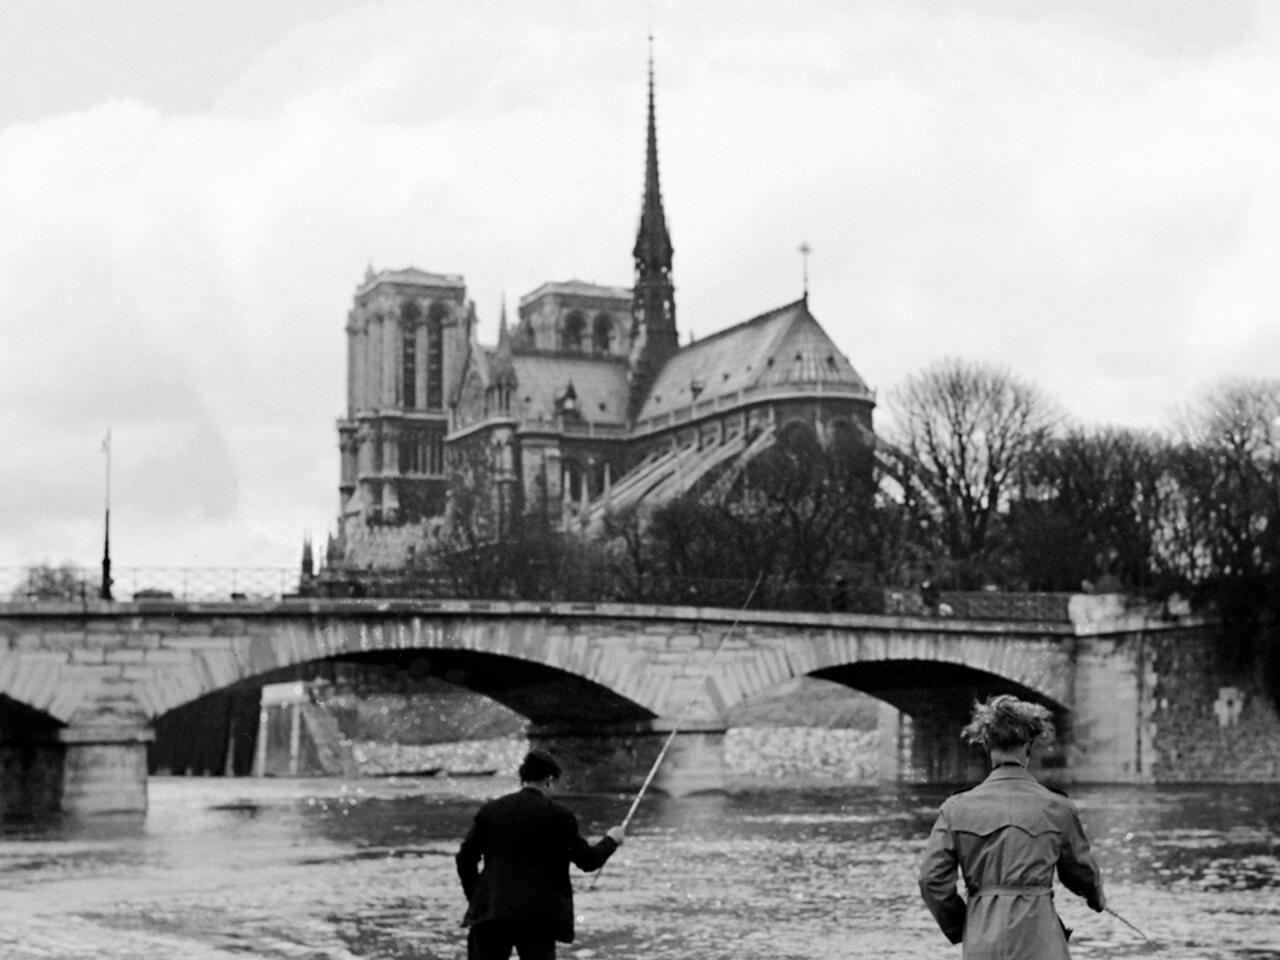 Incendio de la Catedral de Notre Dame: una tragedia histórica